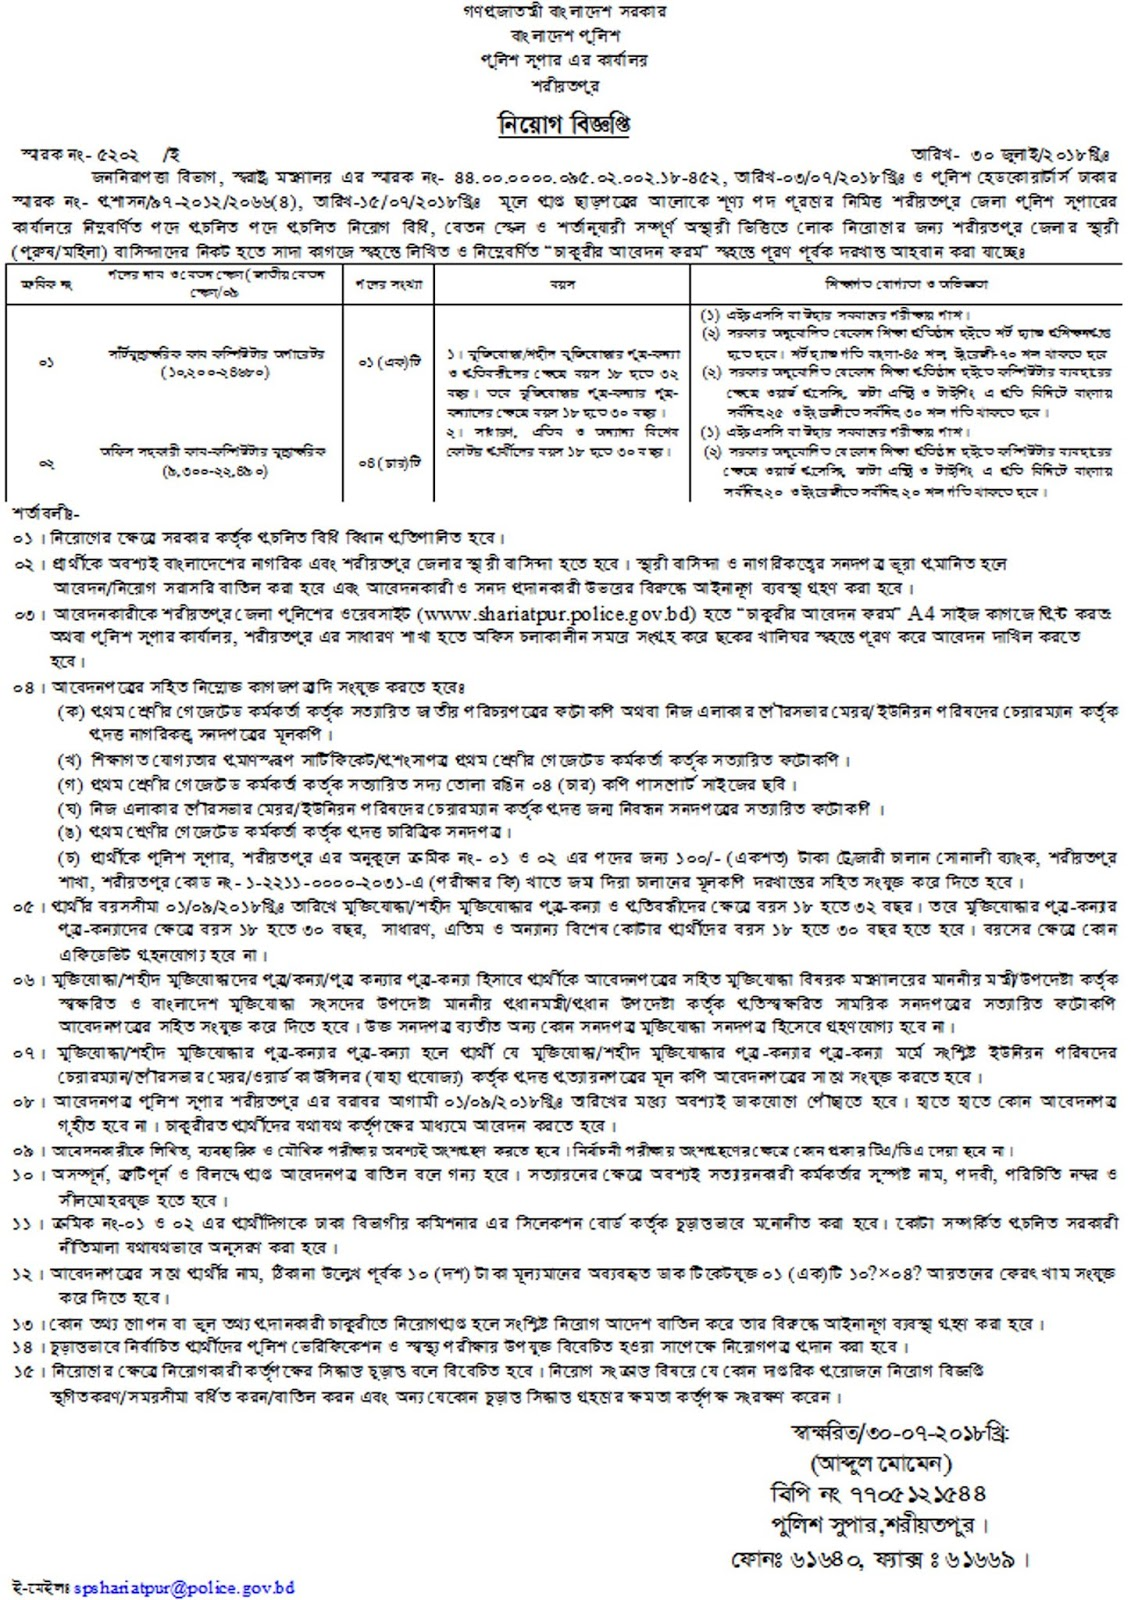 Shariatpur Police Super Office Job Circular 2018